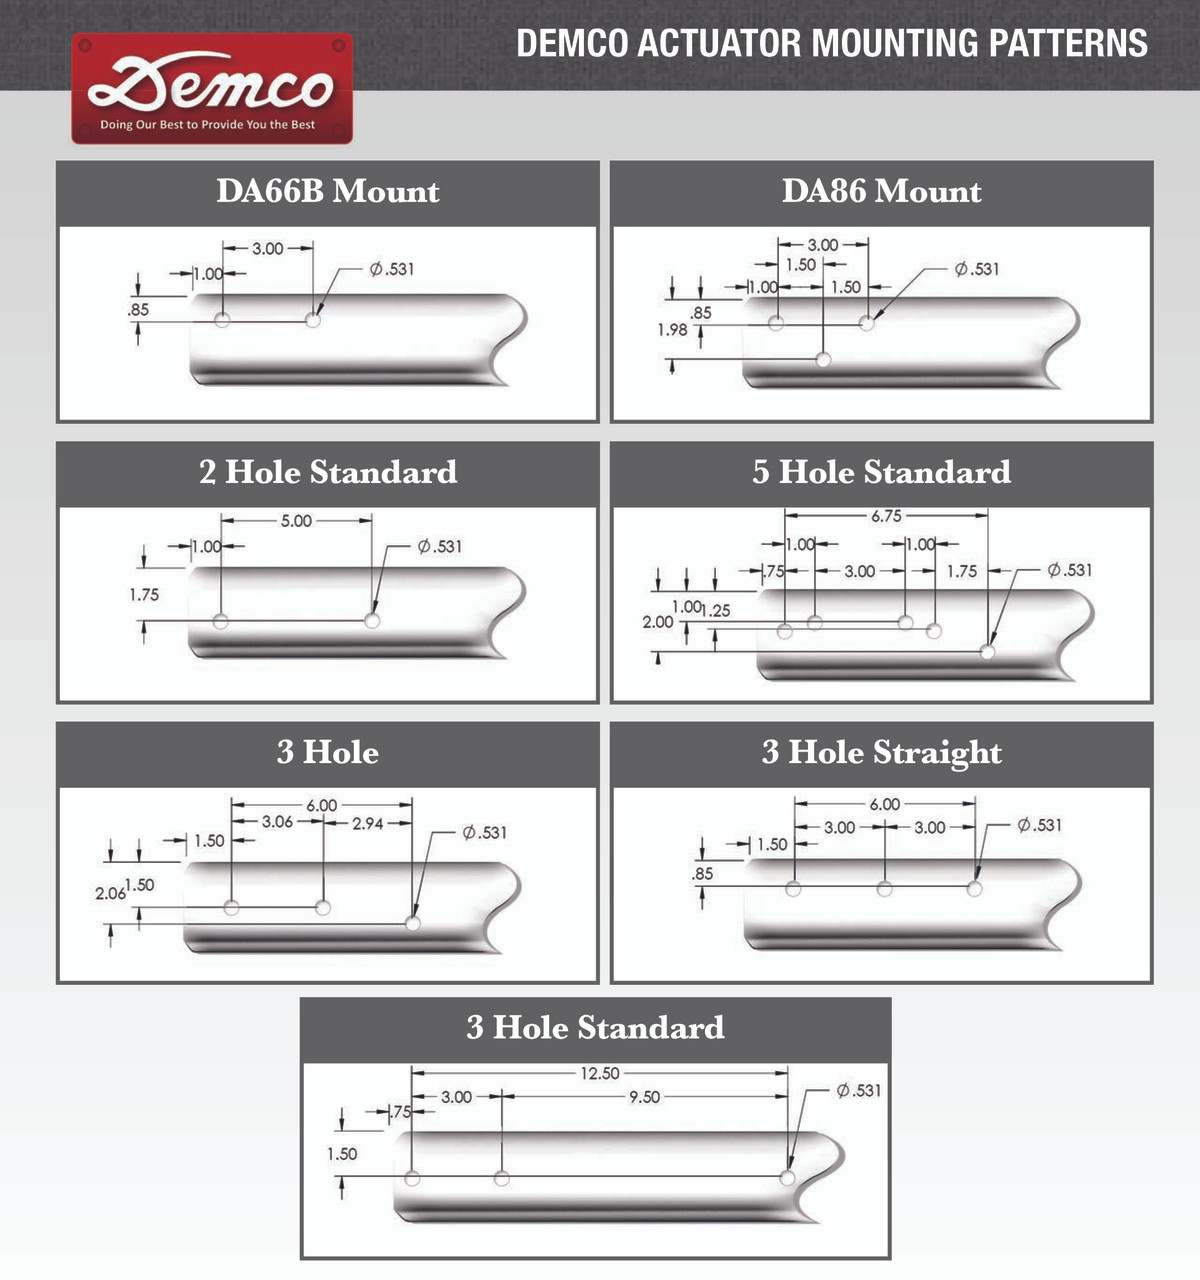 8759152 --- Demco Hydraulic Brake Actuator with Flat Plate - 8,000 lb Capacity - Model DA91